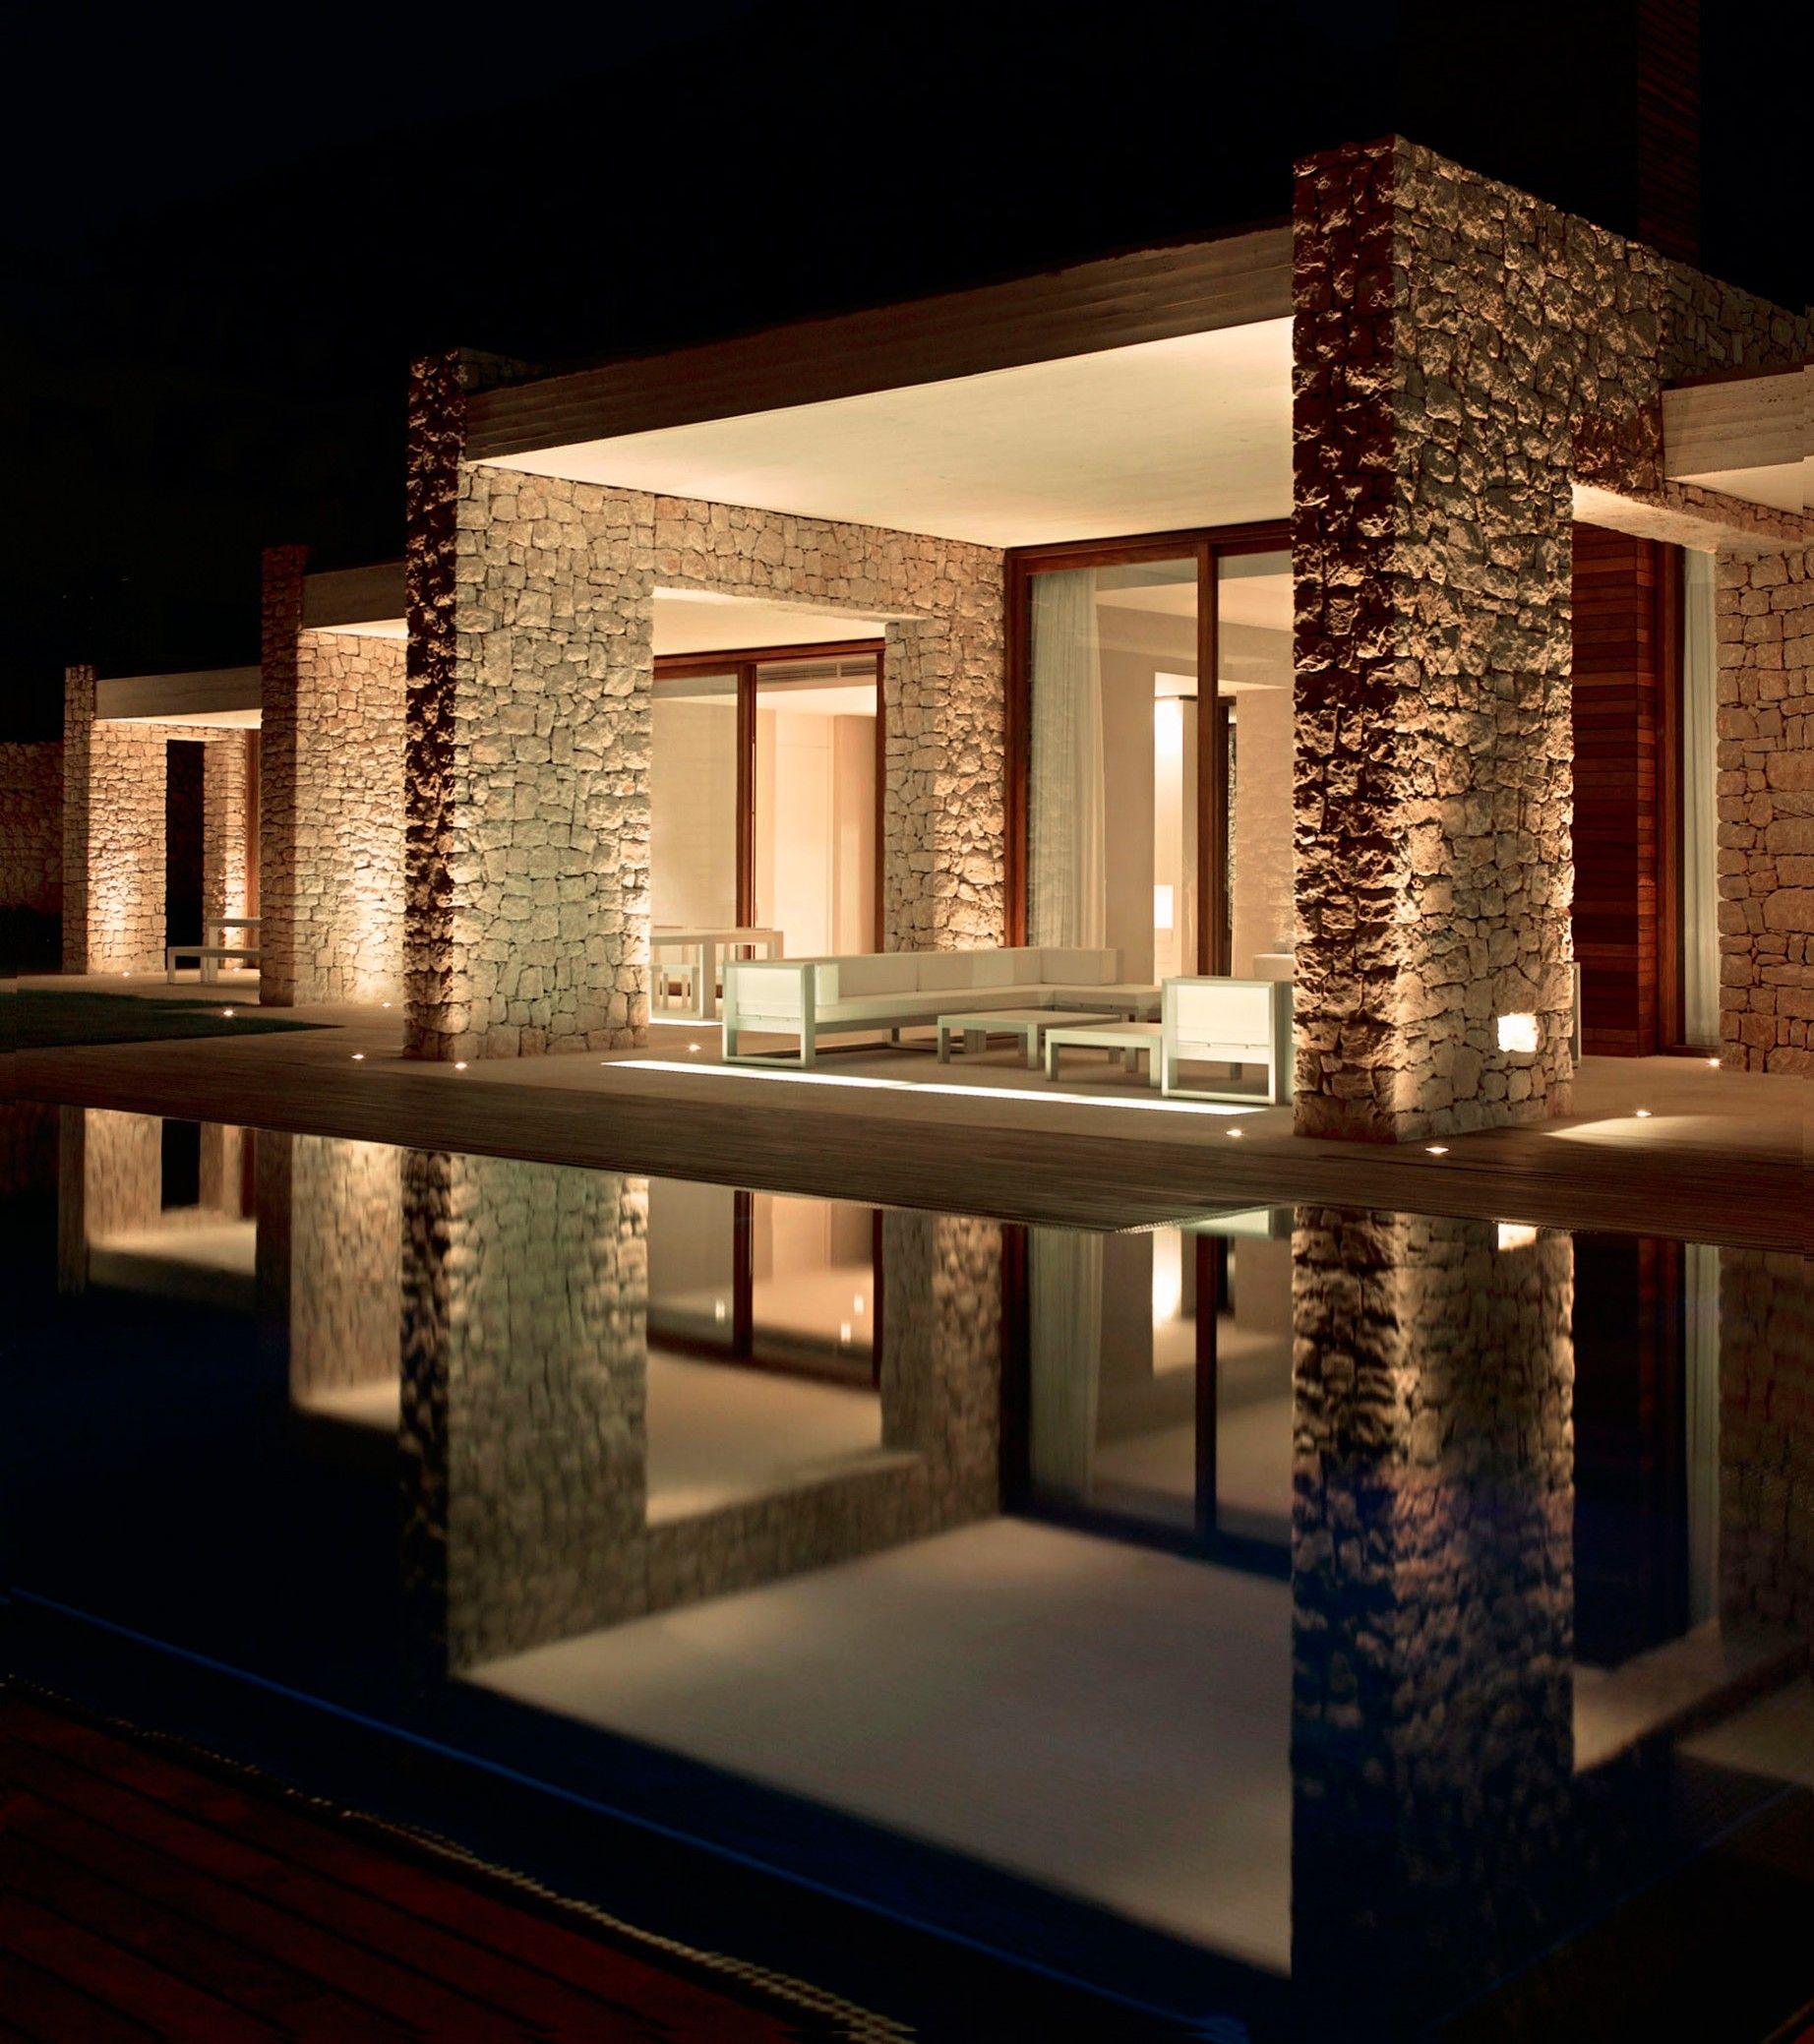 iluminaci n exterior de una casa de dise o ideas de